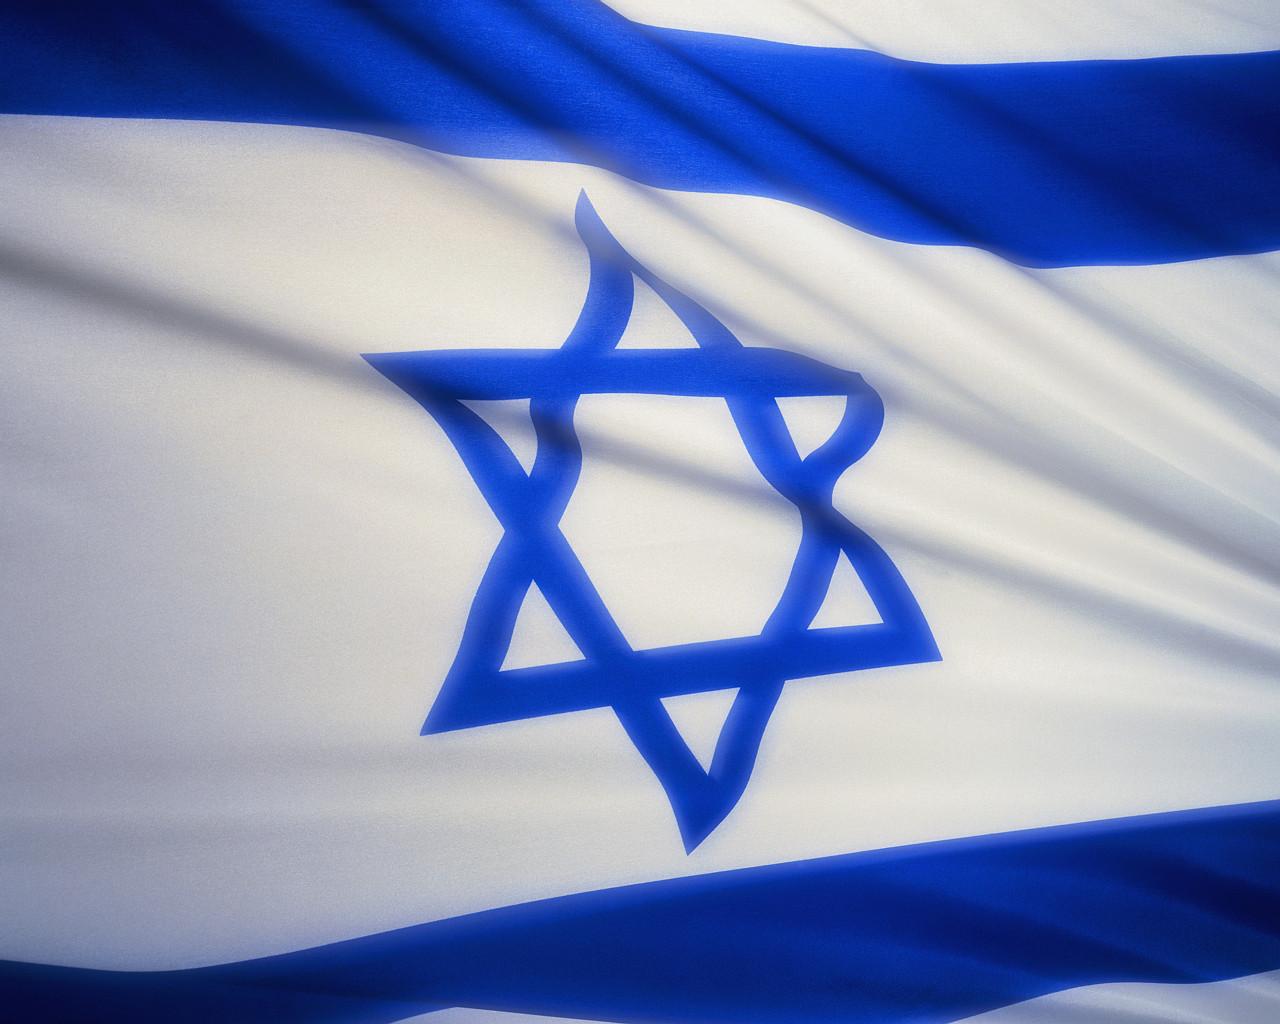 Evangelicals Support Israel